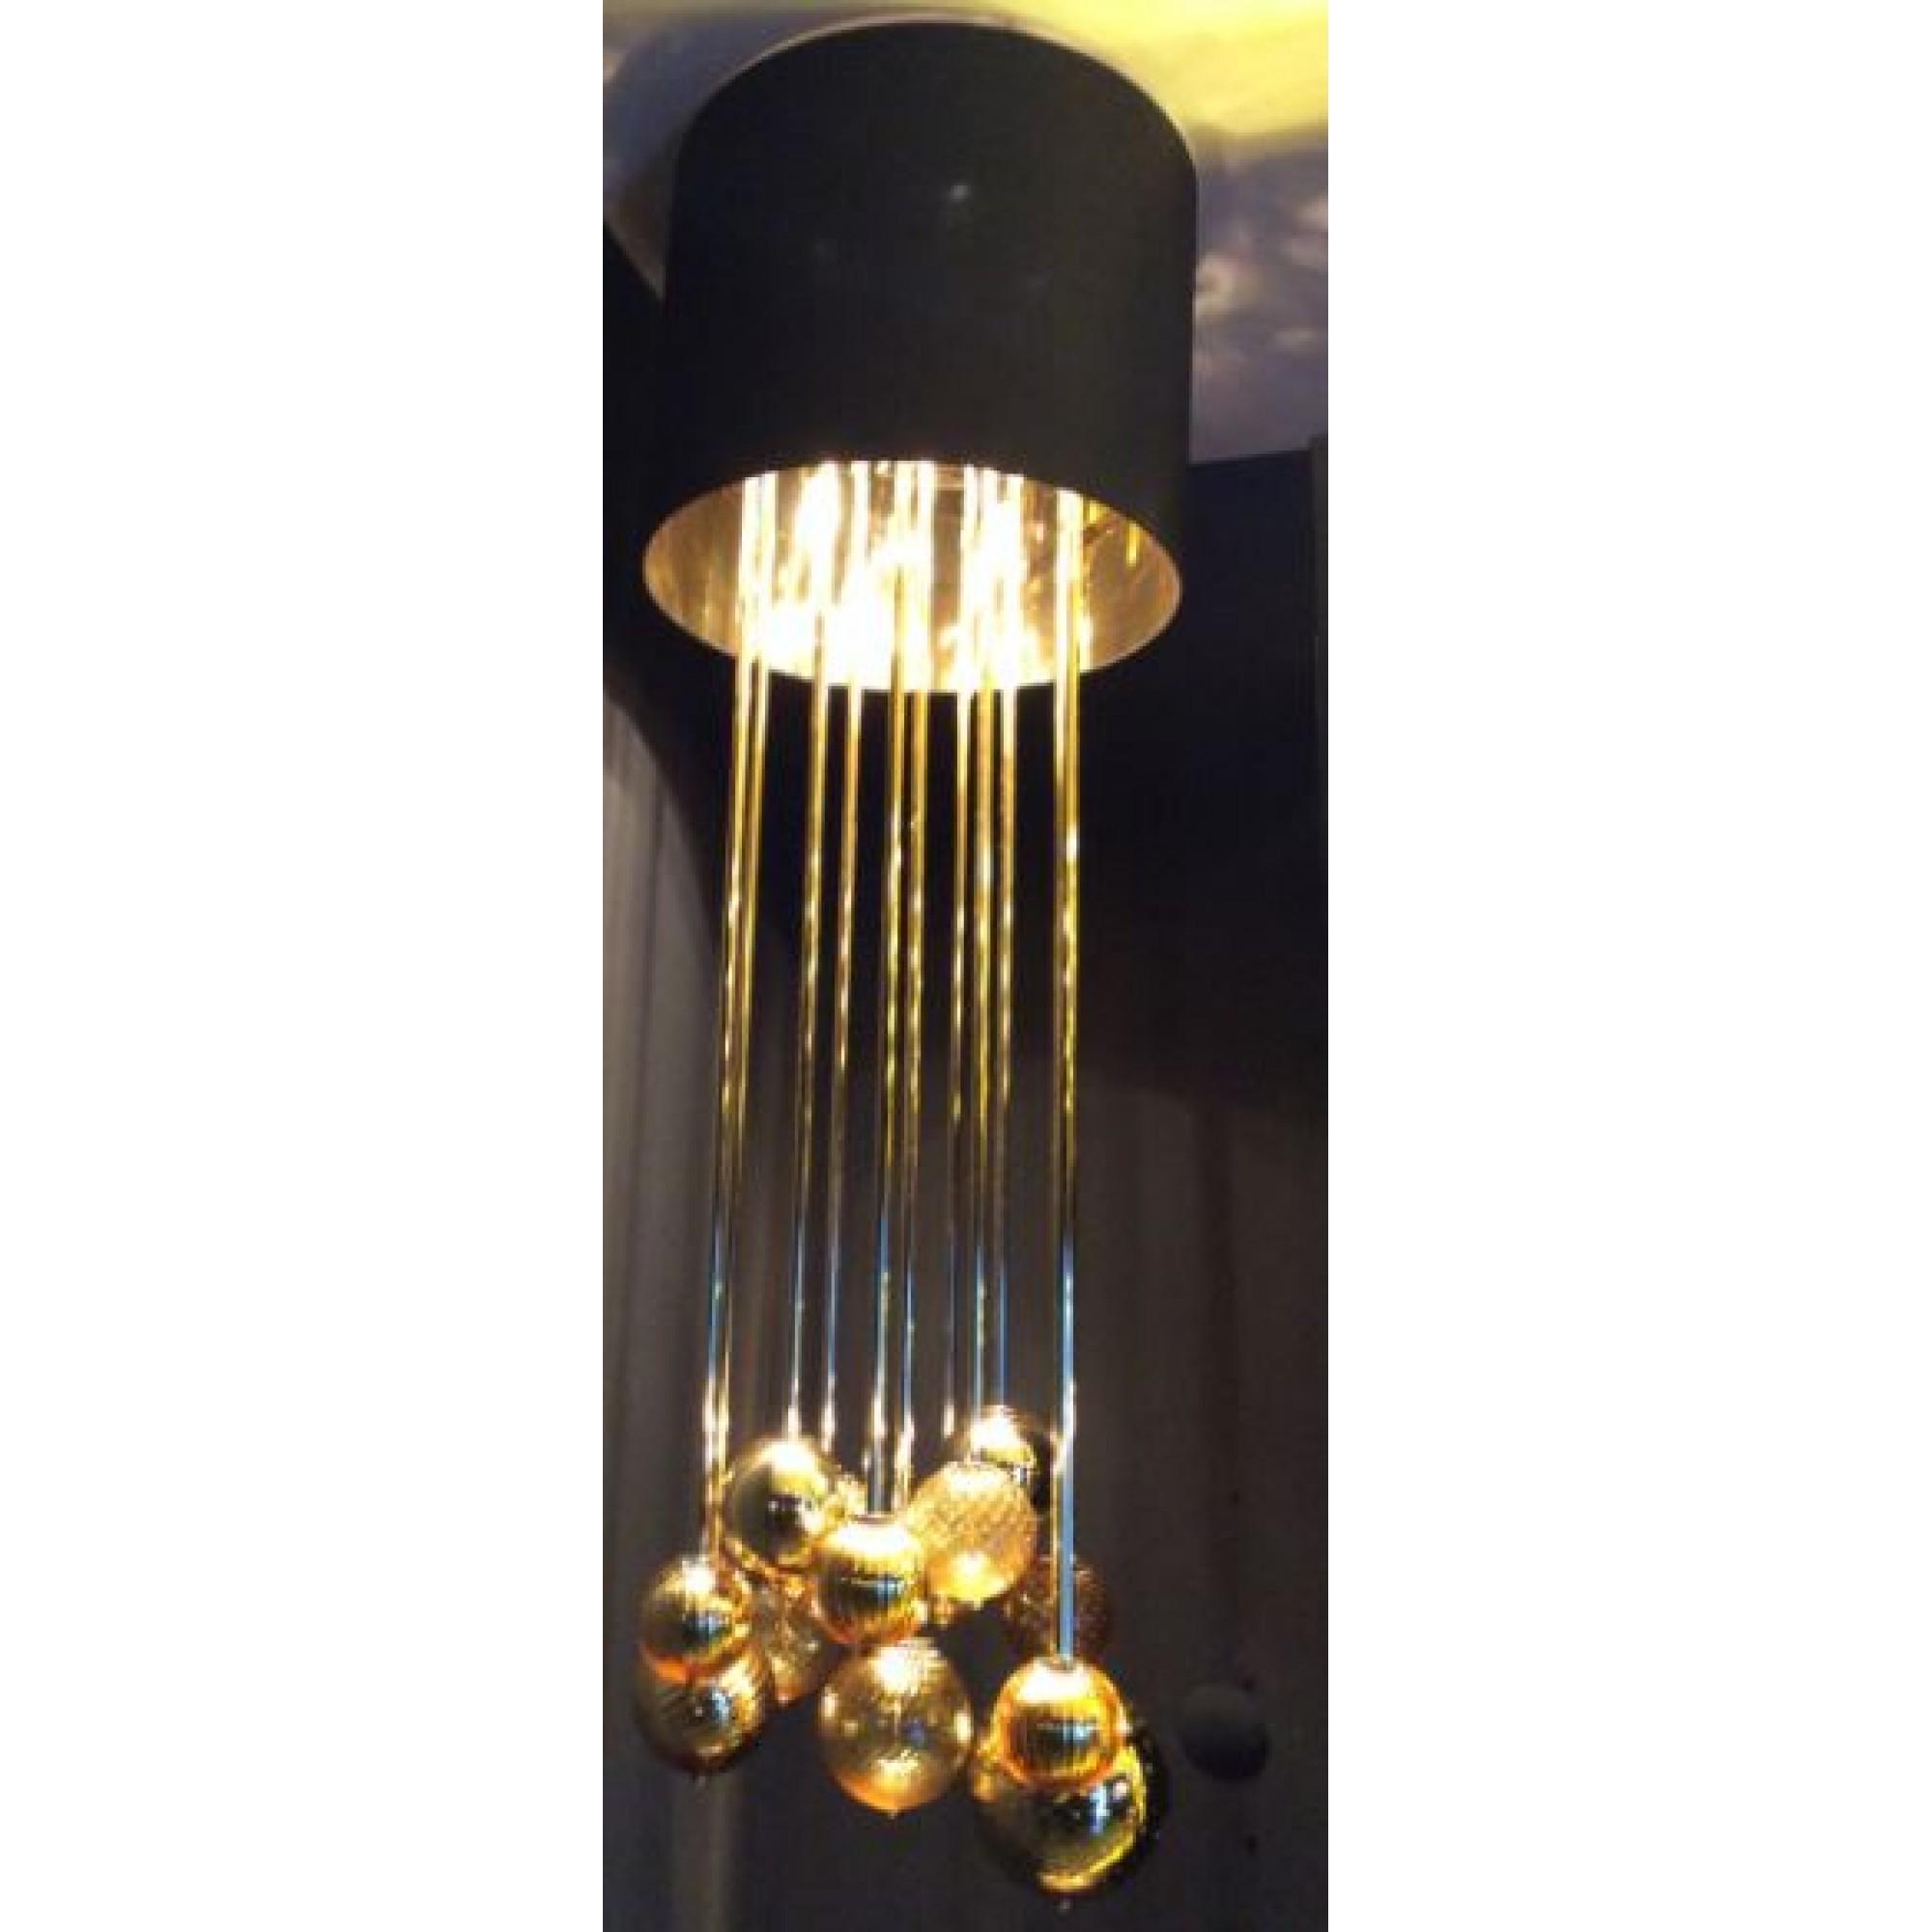 GIOVE CHANDELIER 4L AMBER DARK BROWN LAMPSHADE - Murano -  ROBERTO CAVALLI